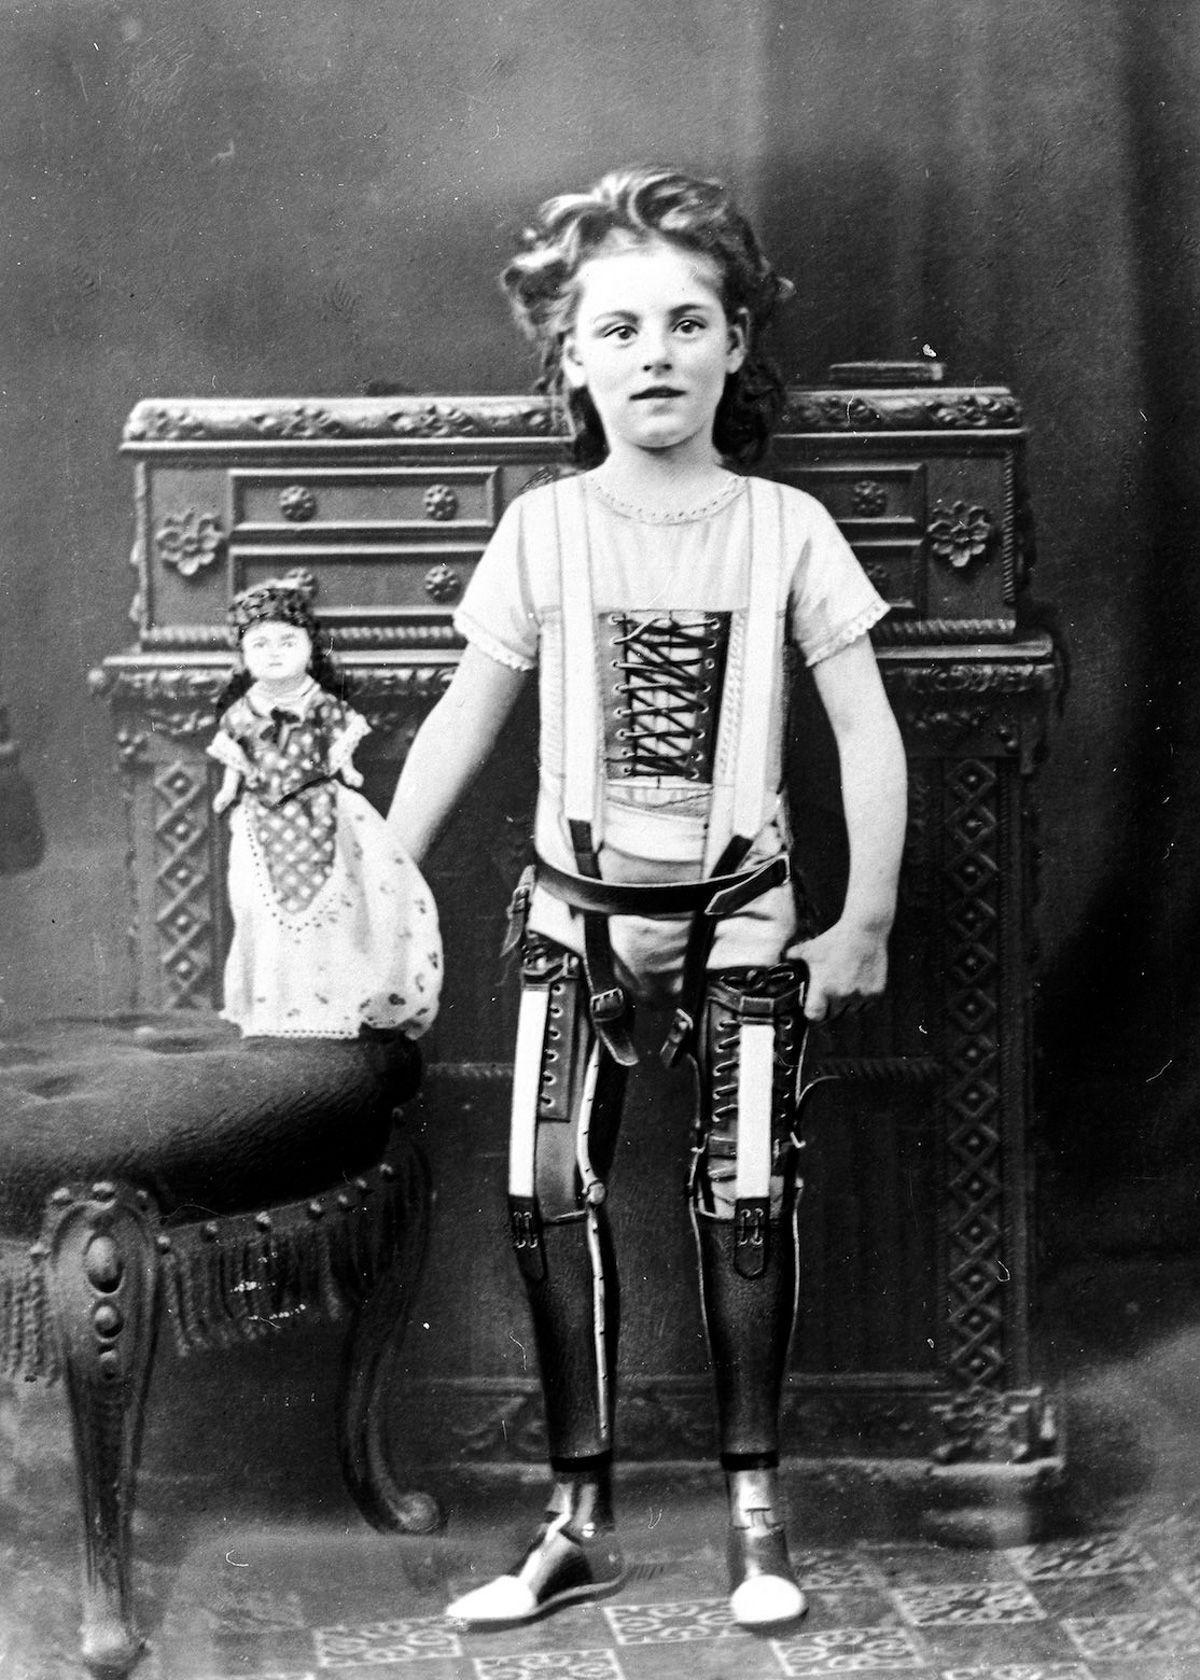 Young girl wearing prosthetic legs Chard England 1890 1910… – History